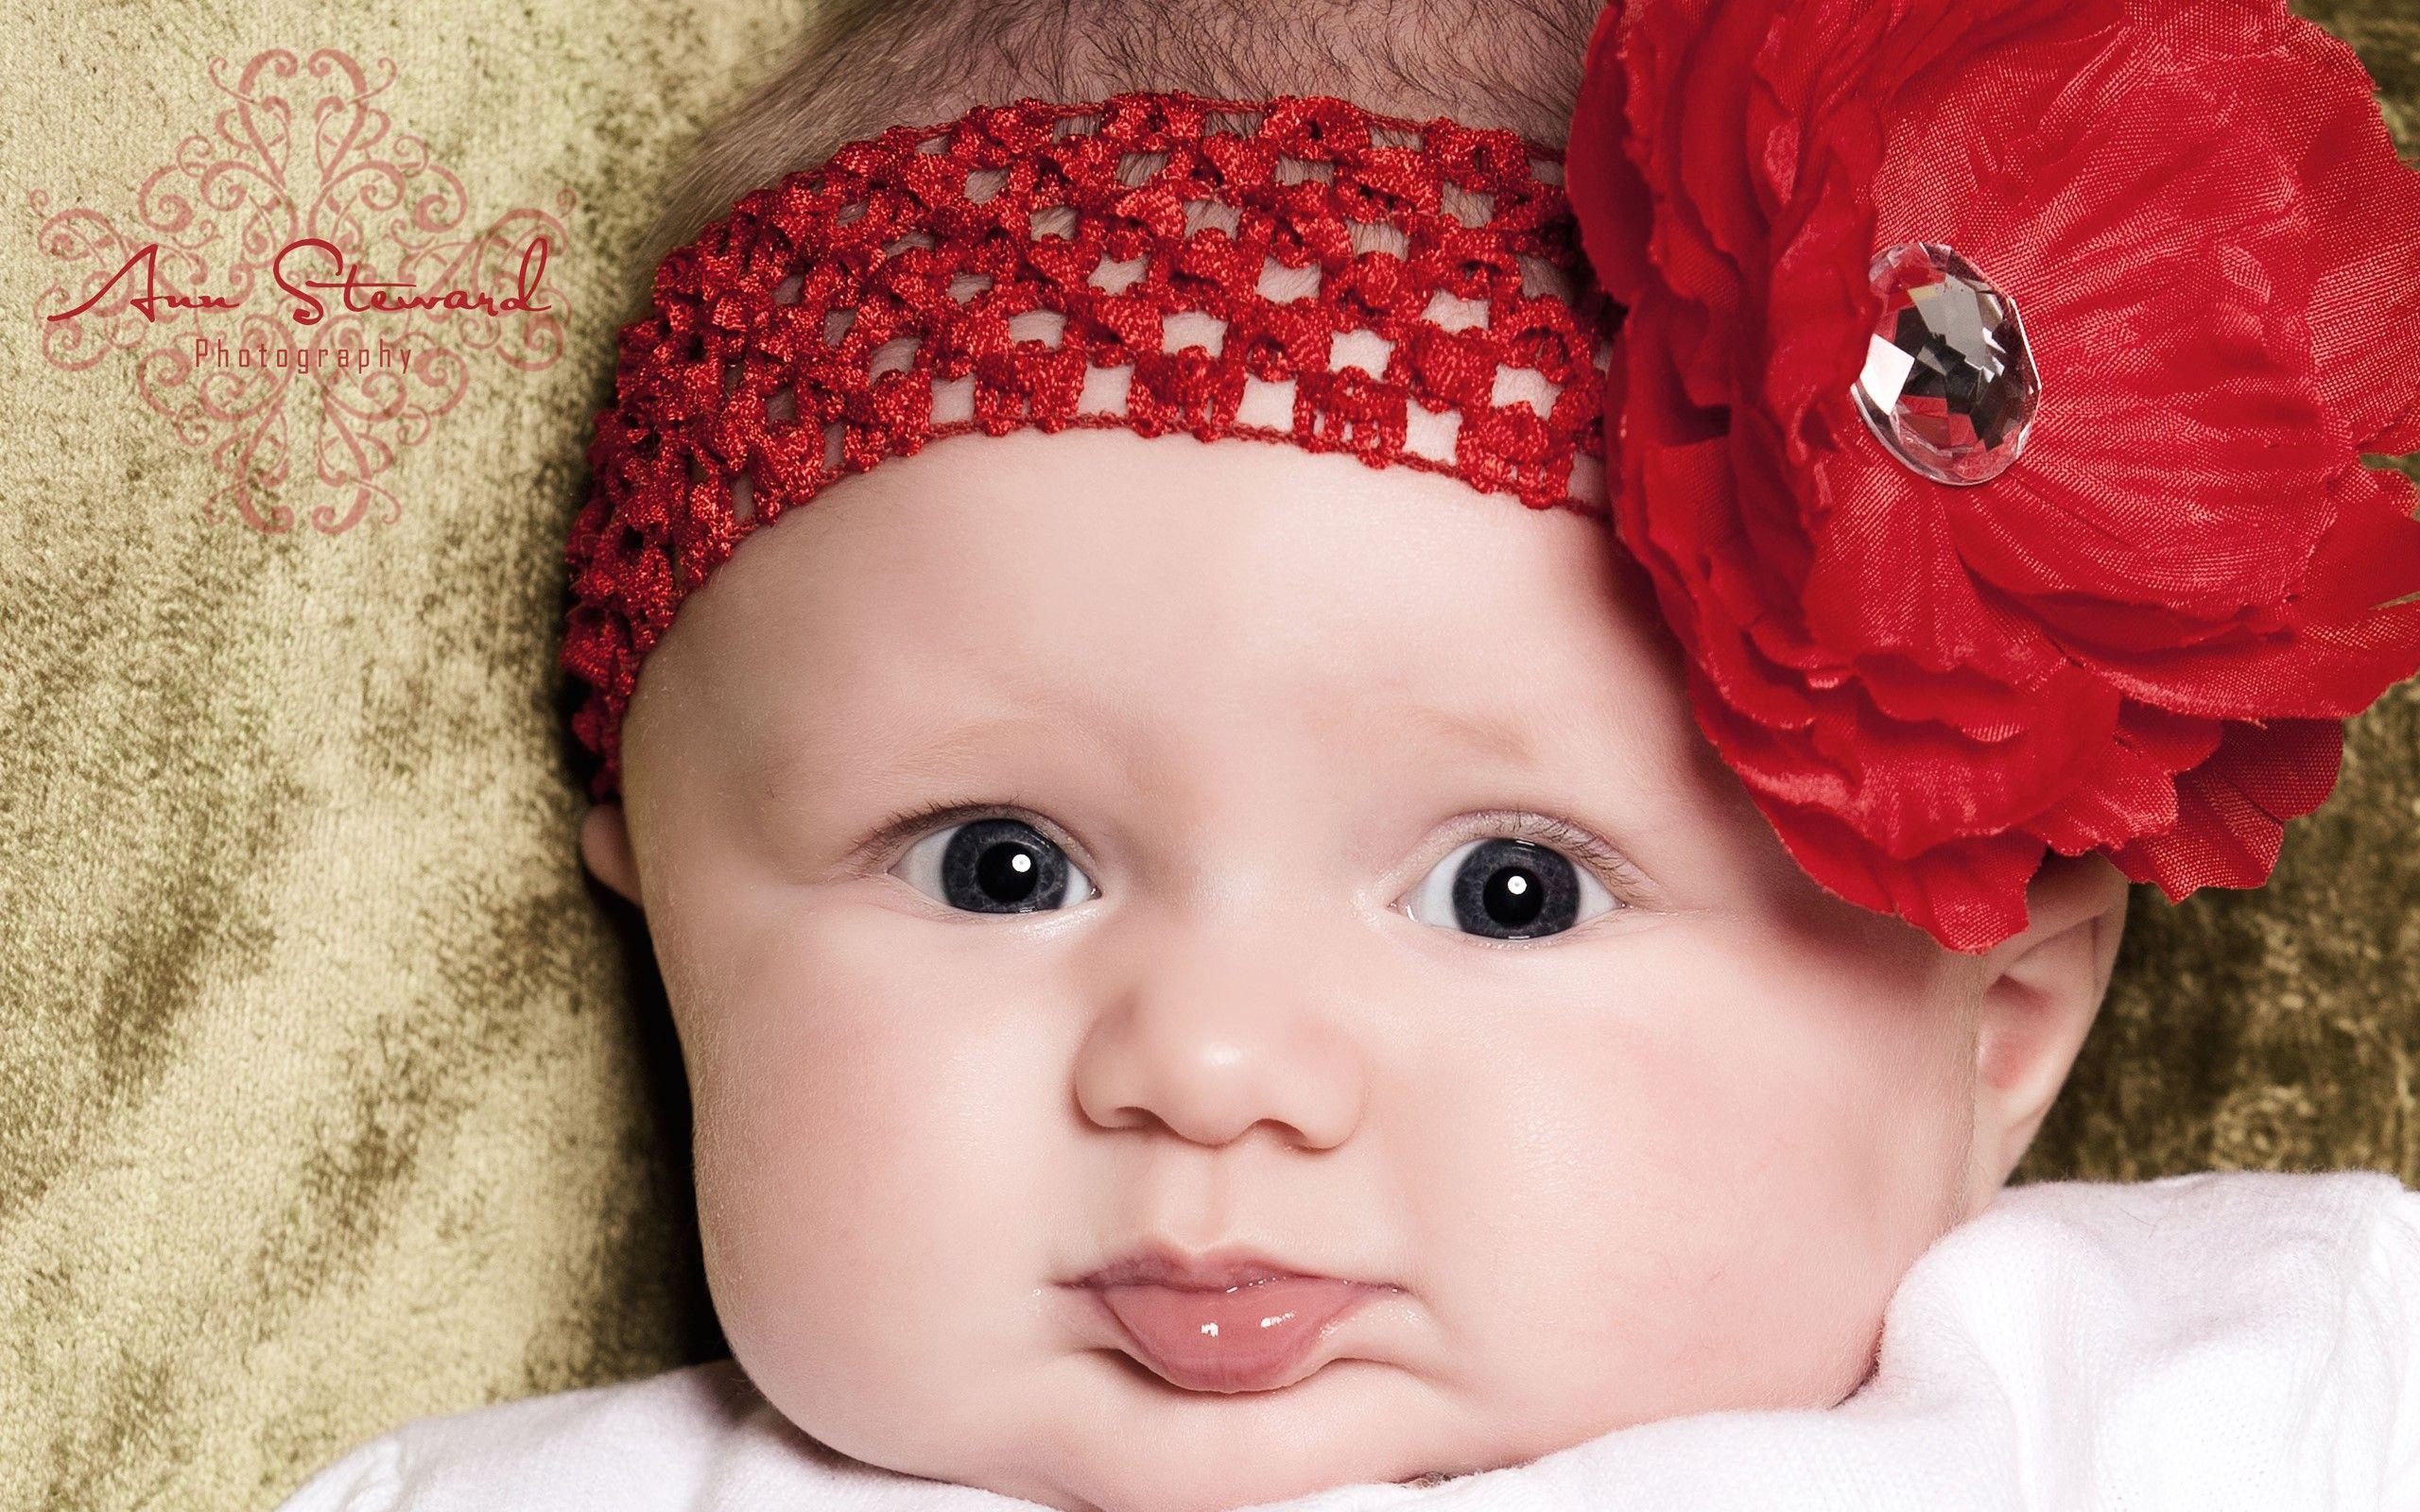 Wallpaper download cute - Cute Girl Babies Wallpapers Very Cute